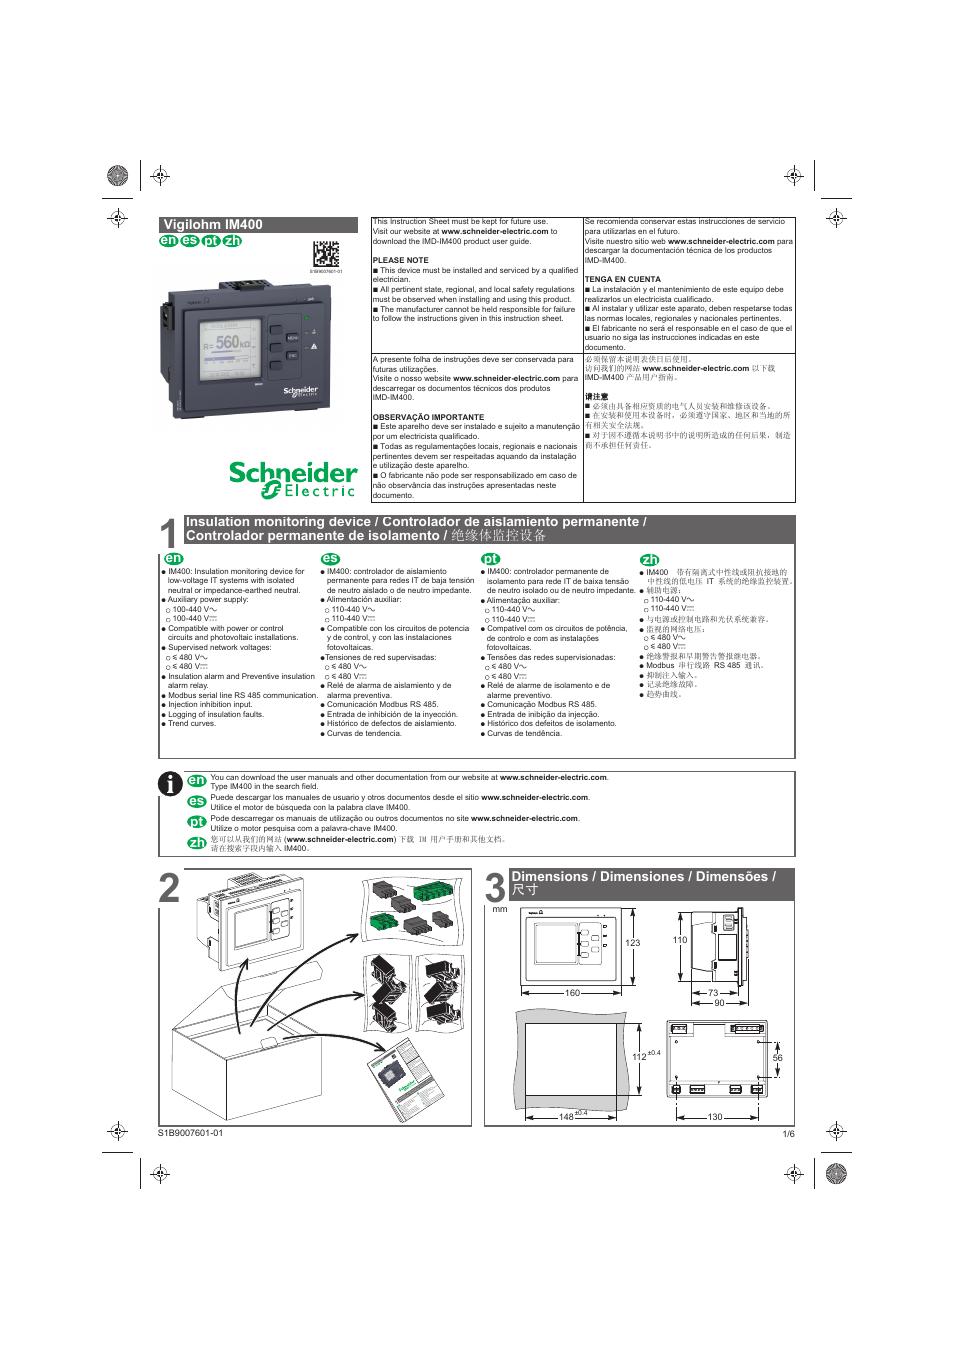 schneider electric vigilohm im400 user manual